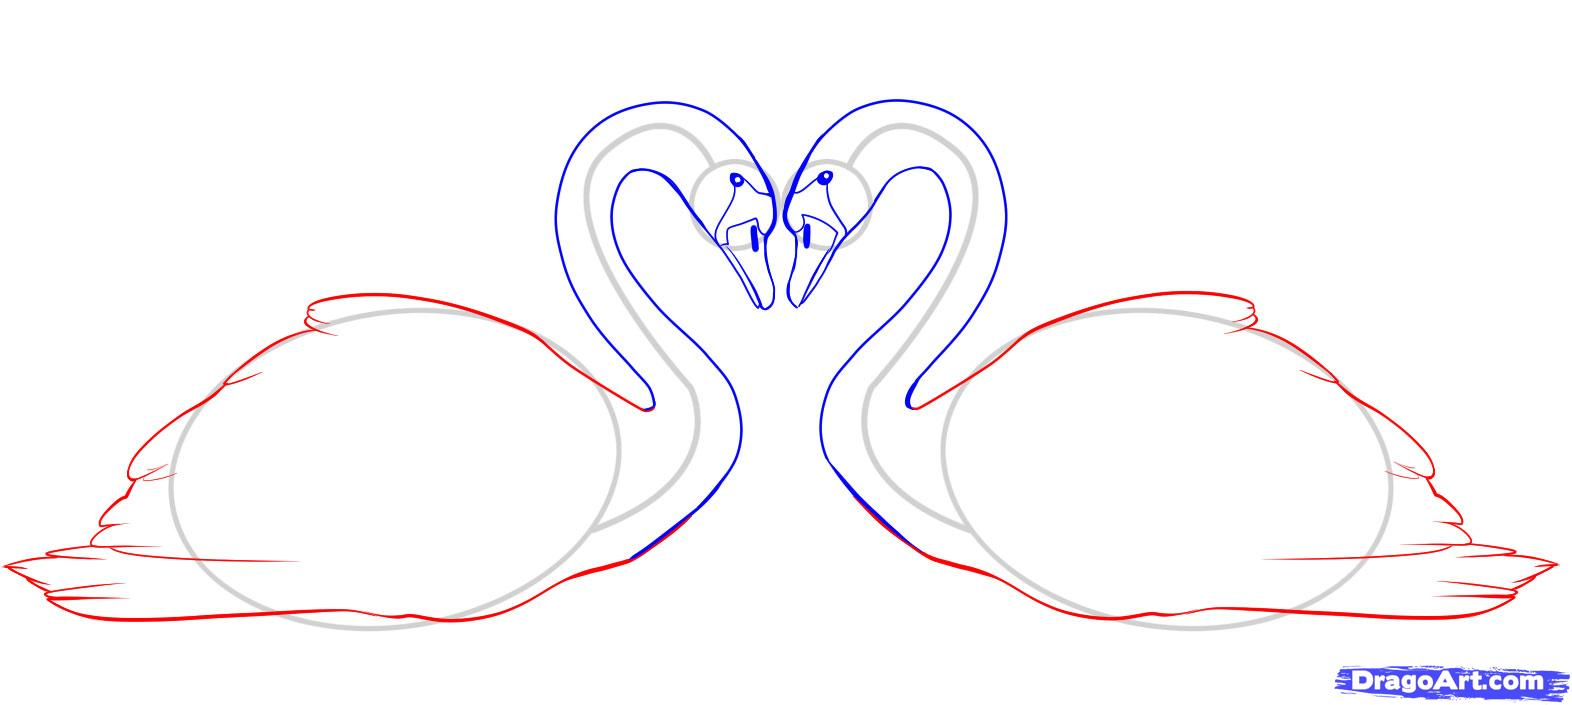 Рисуем двух лебедей - шаг 5